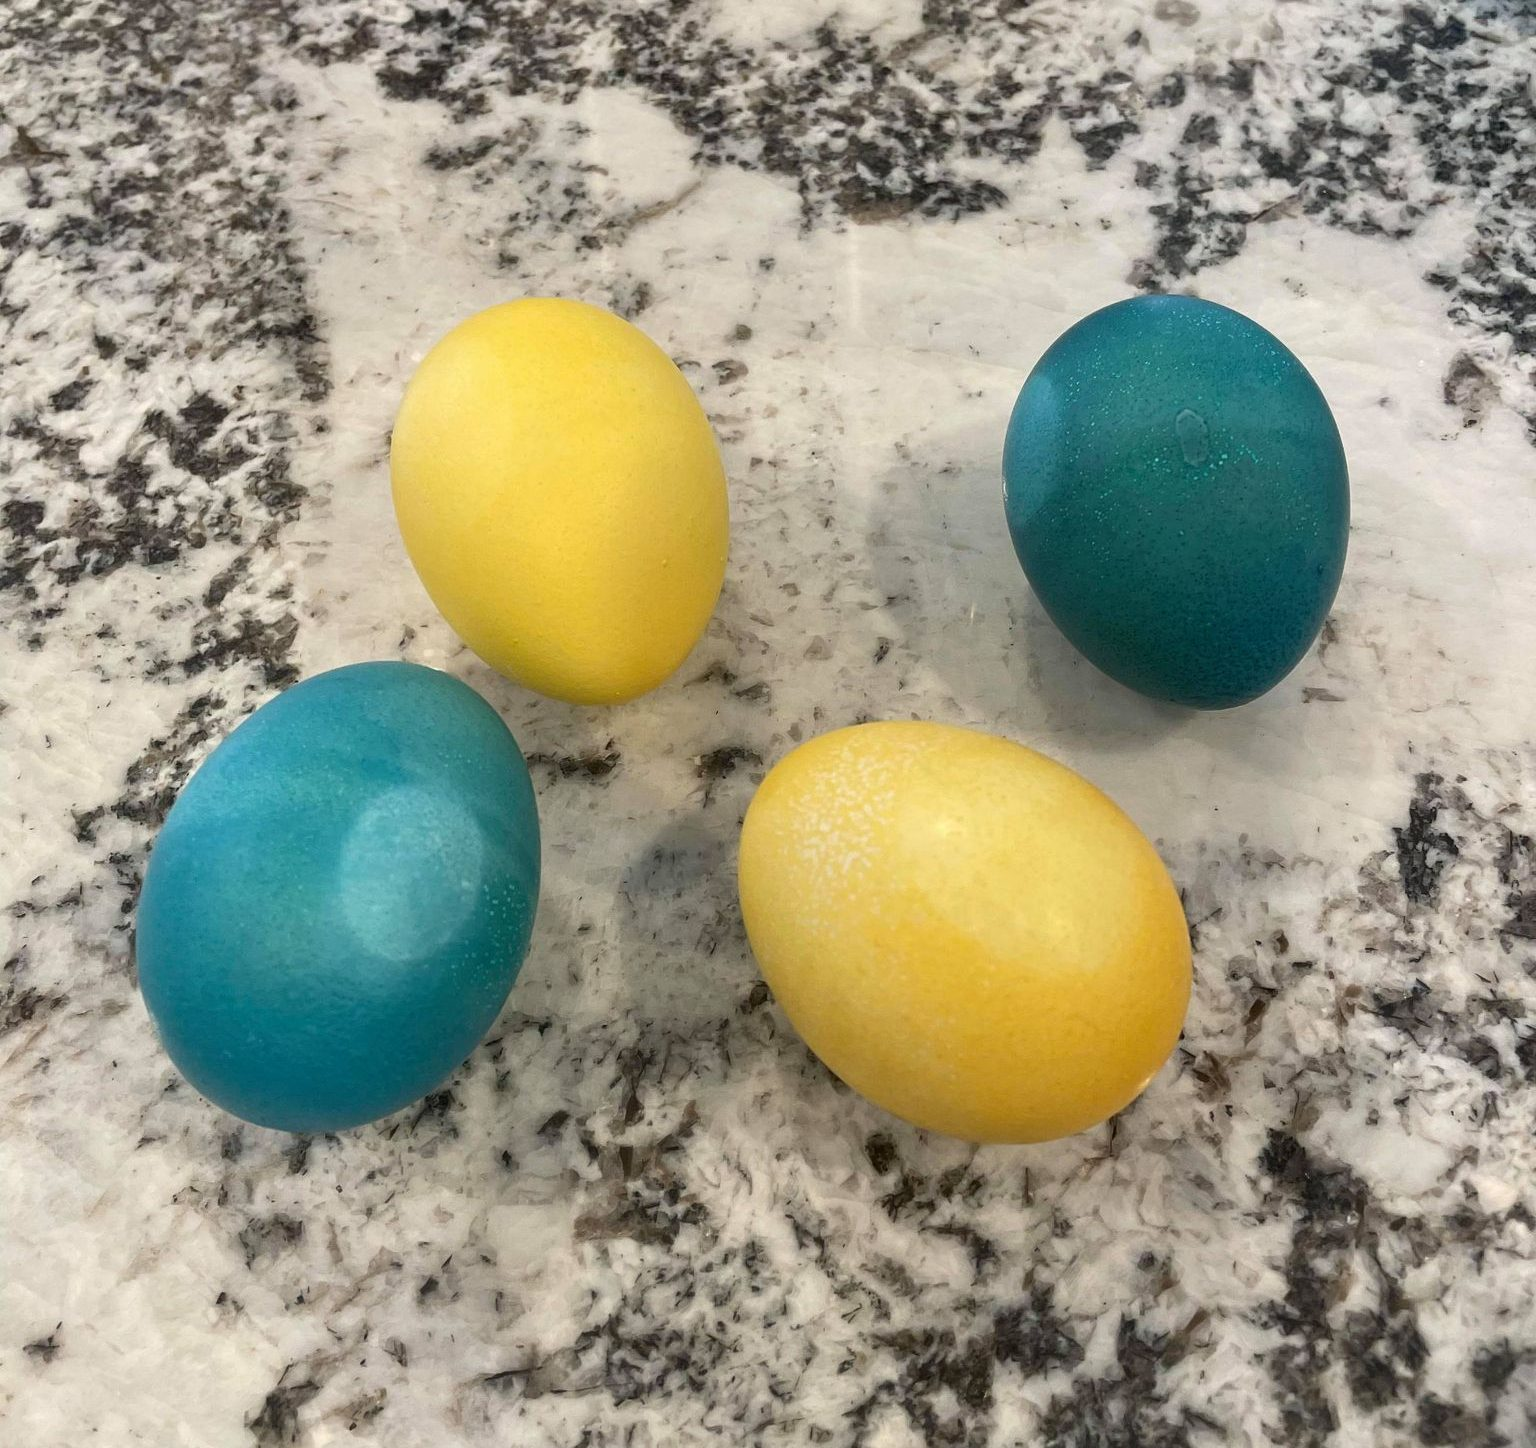 Box-Dyed Eggs